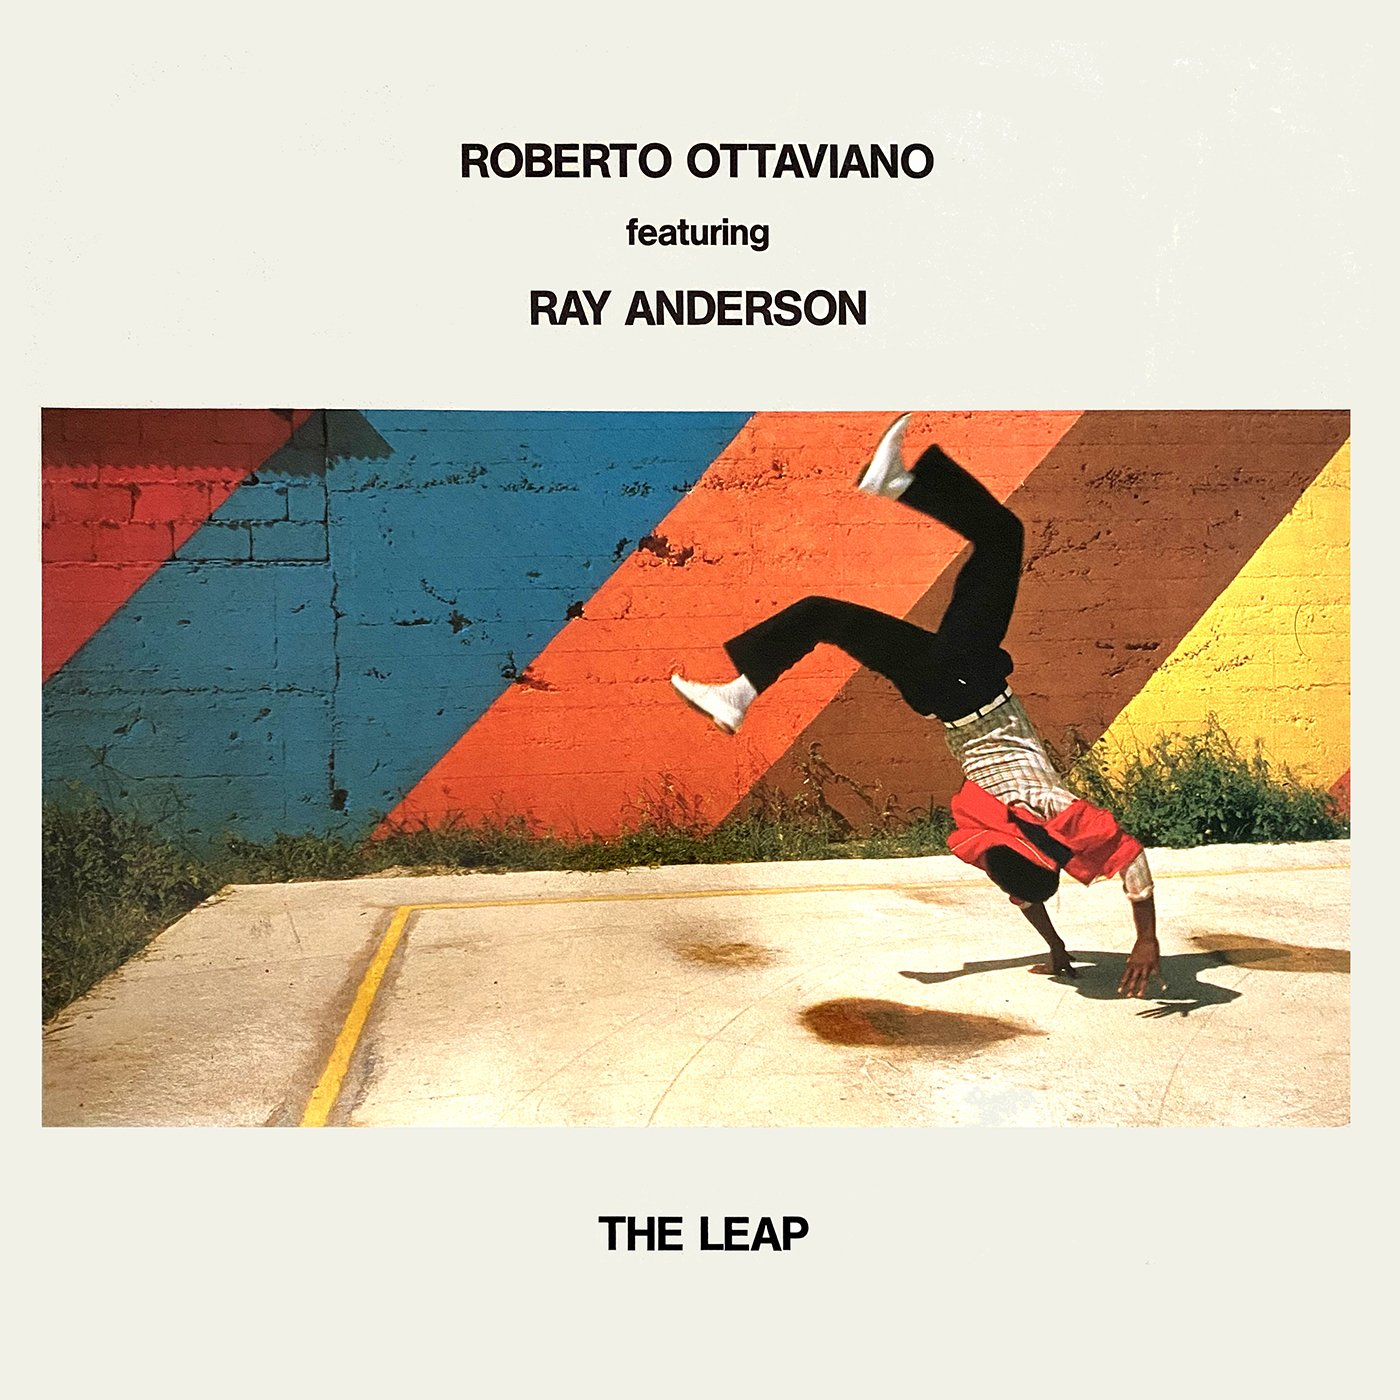 The Leap - Roberto OttavianoFeaturingRay Anderson